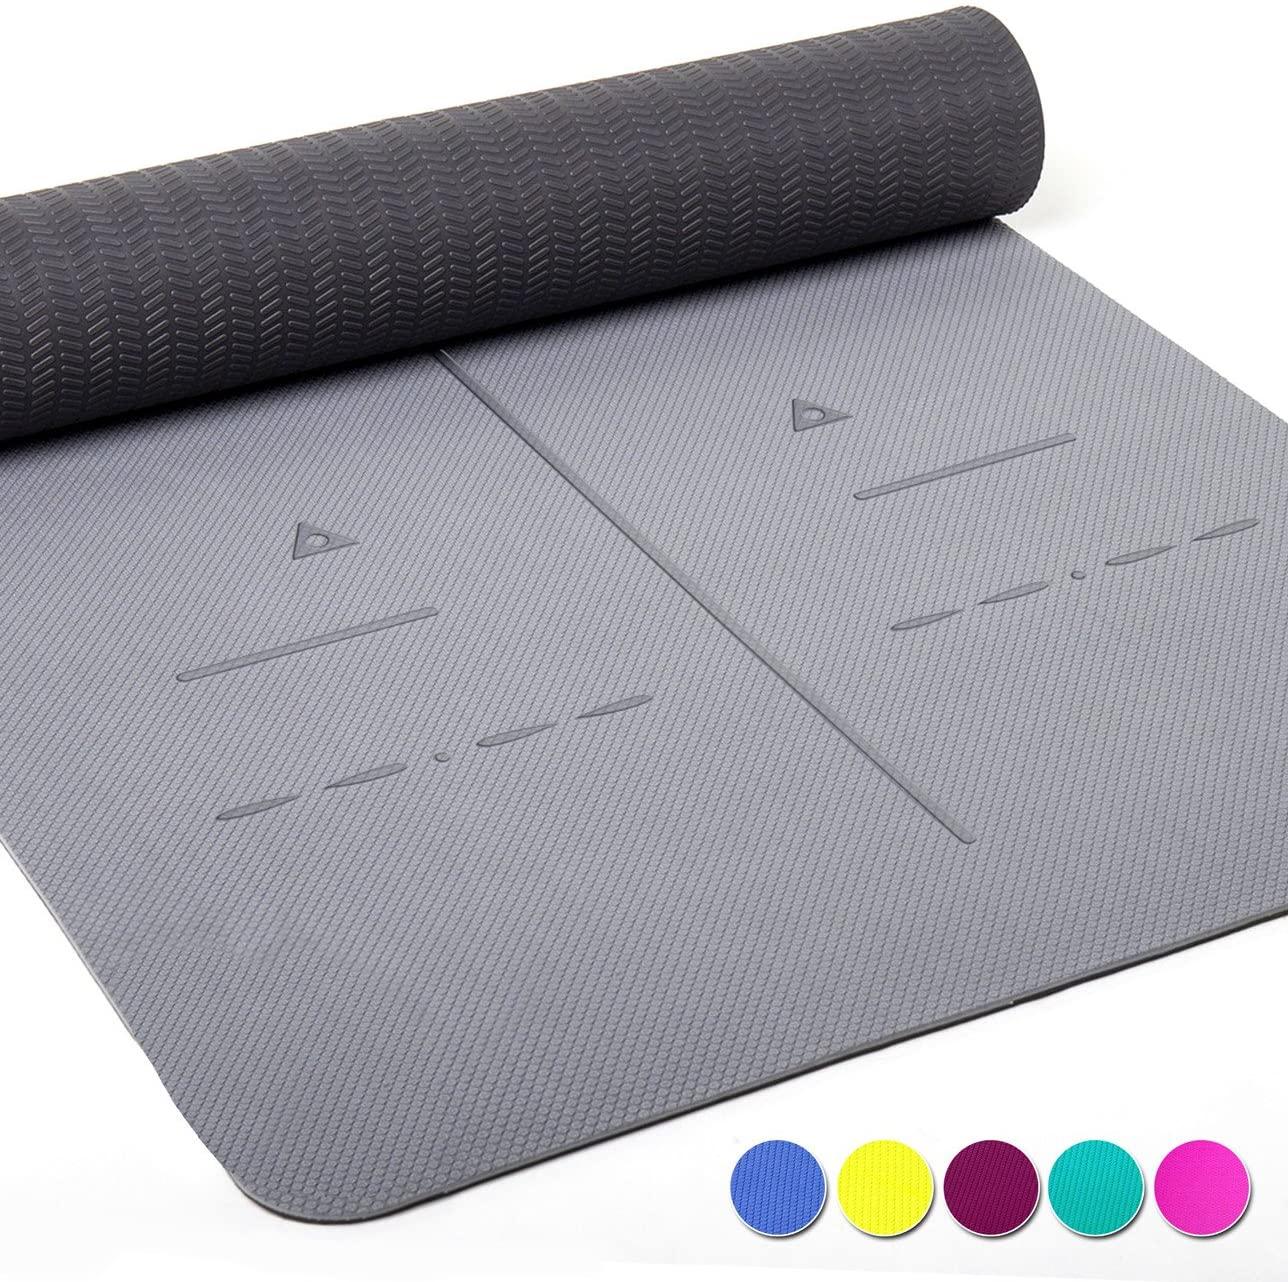 heathyoga eco friendly nonslip yoga mat